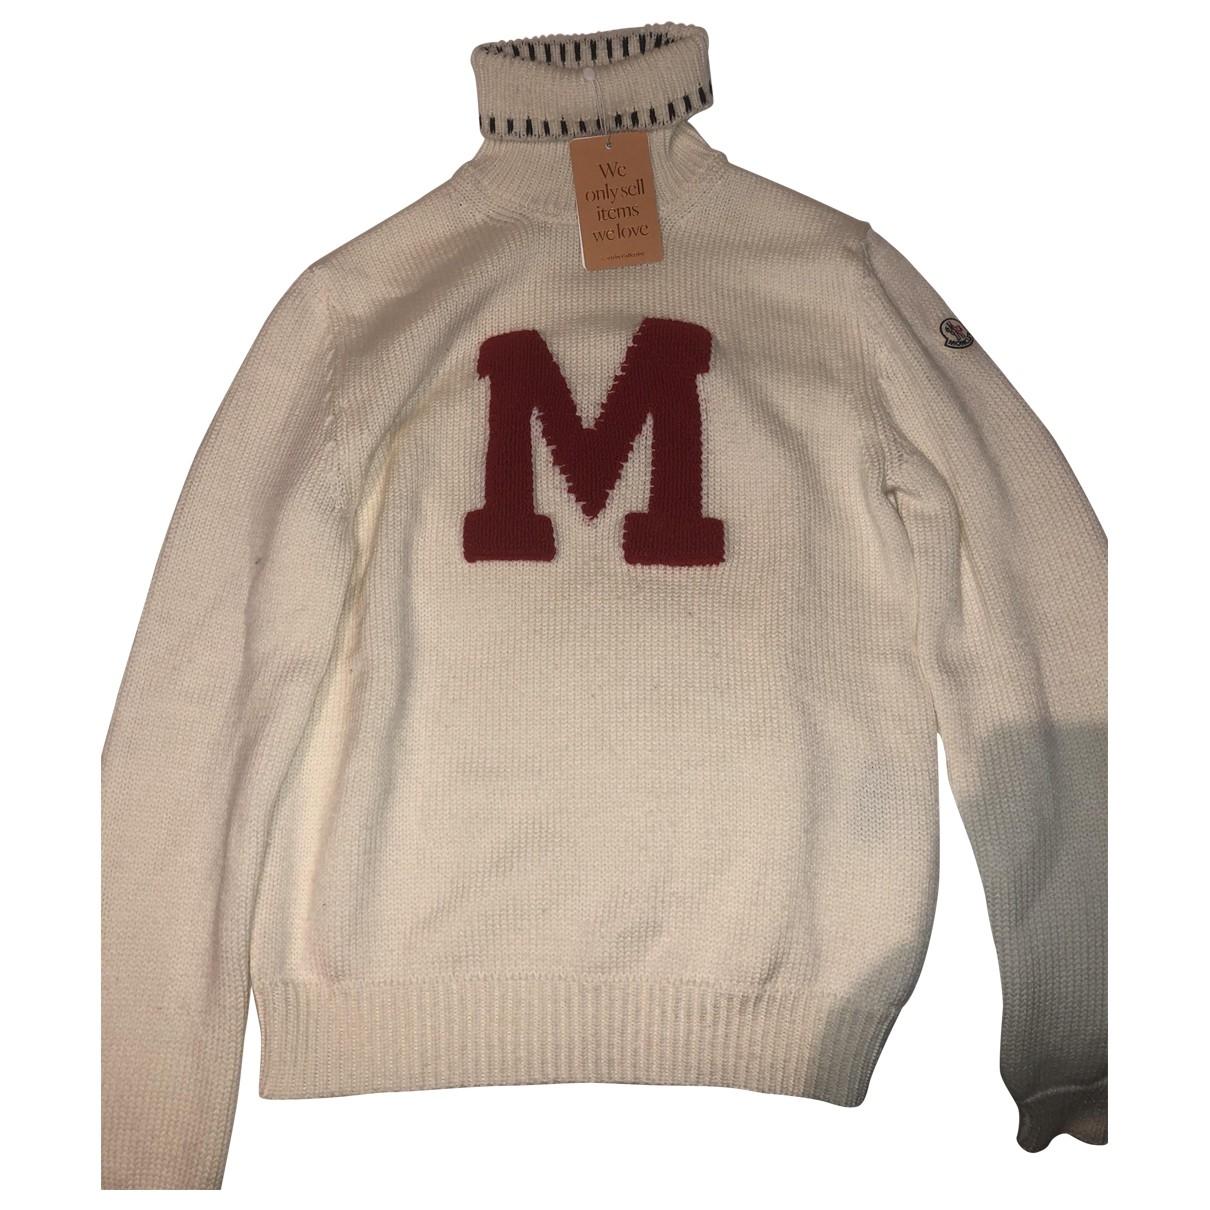 Moncler Genius Moncler n°2 1952 + Valextra Pullover.Westen.Sweatshirts  in  Ecru Wolle